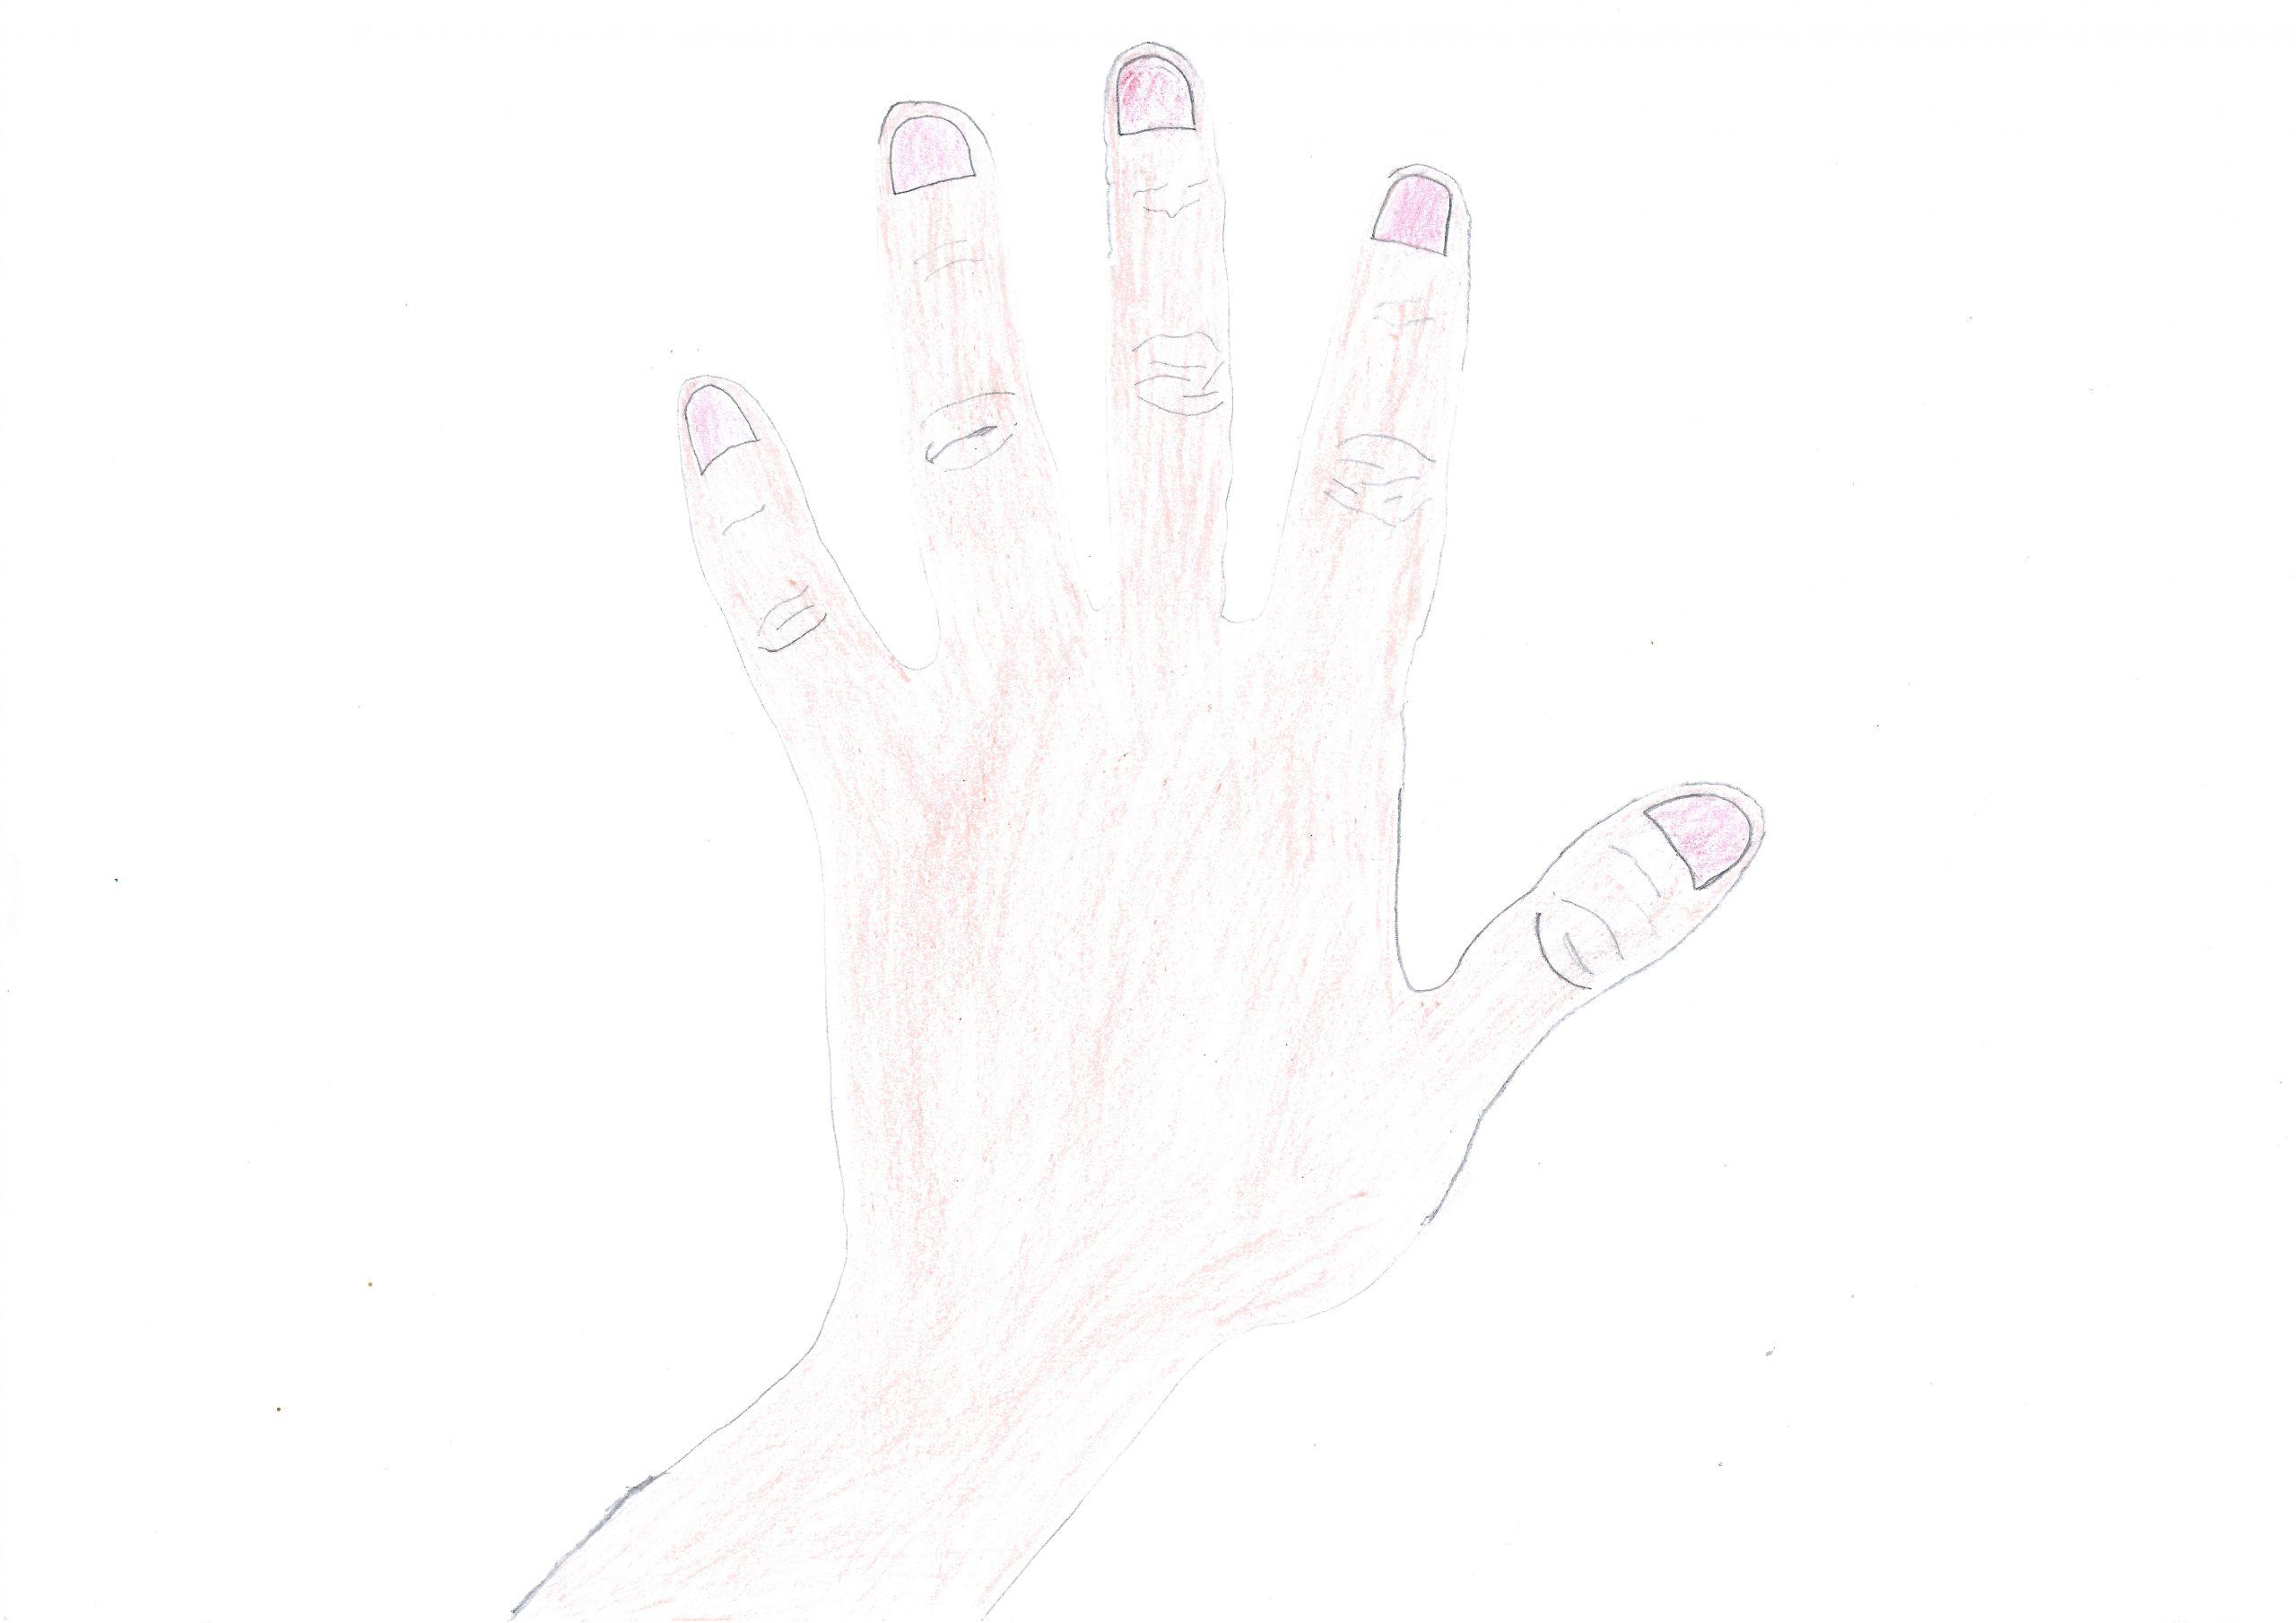 Po — The hand